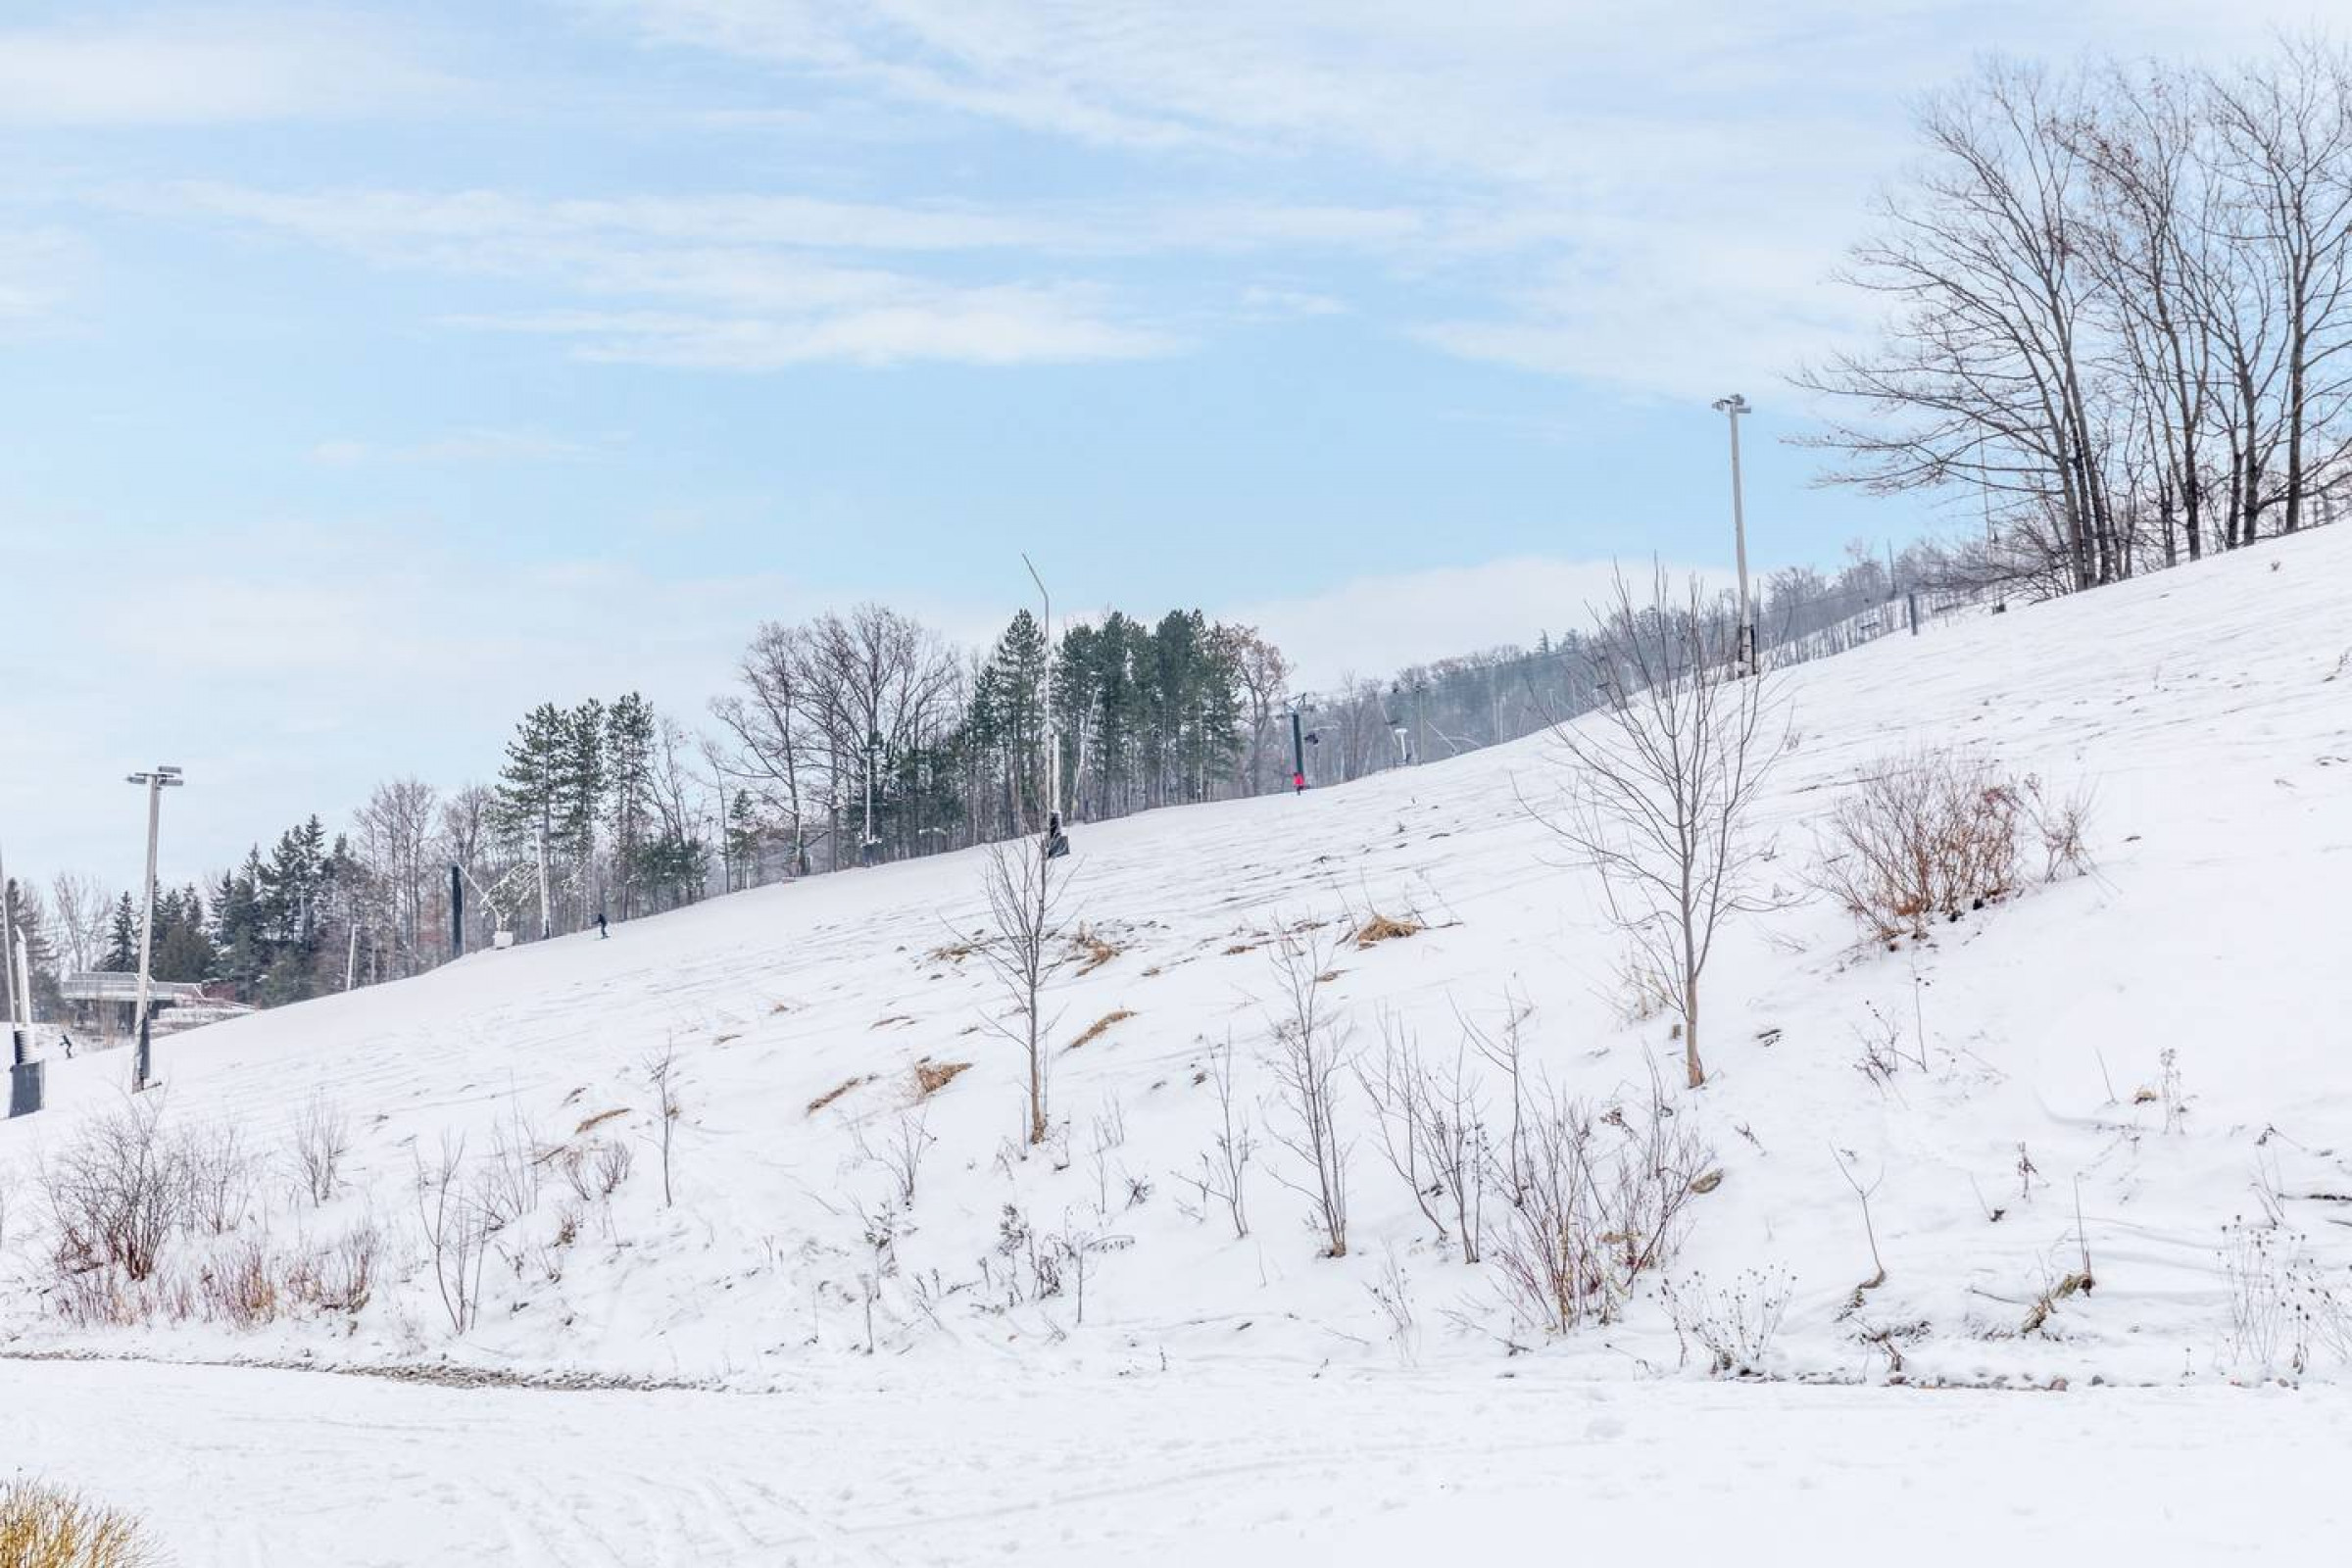 Slope-Side Blue Mountain True Ski In/Ski Out (61377)